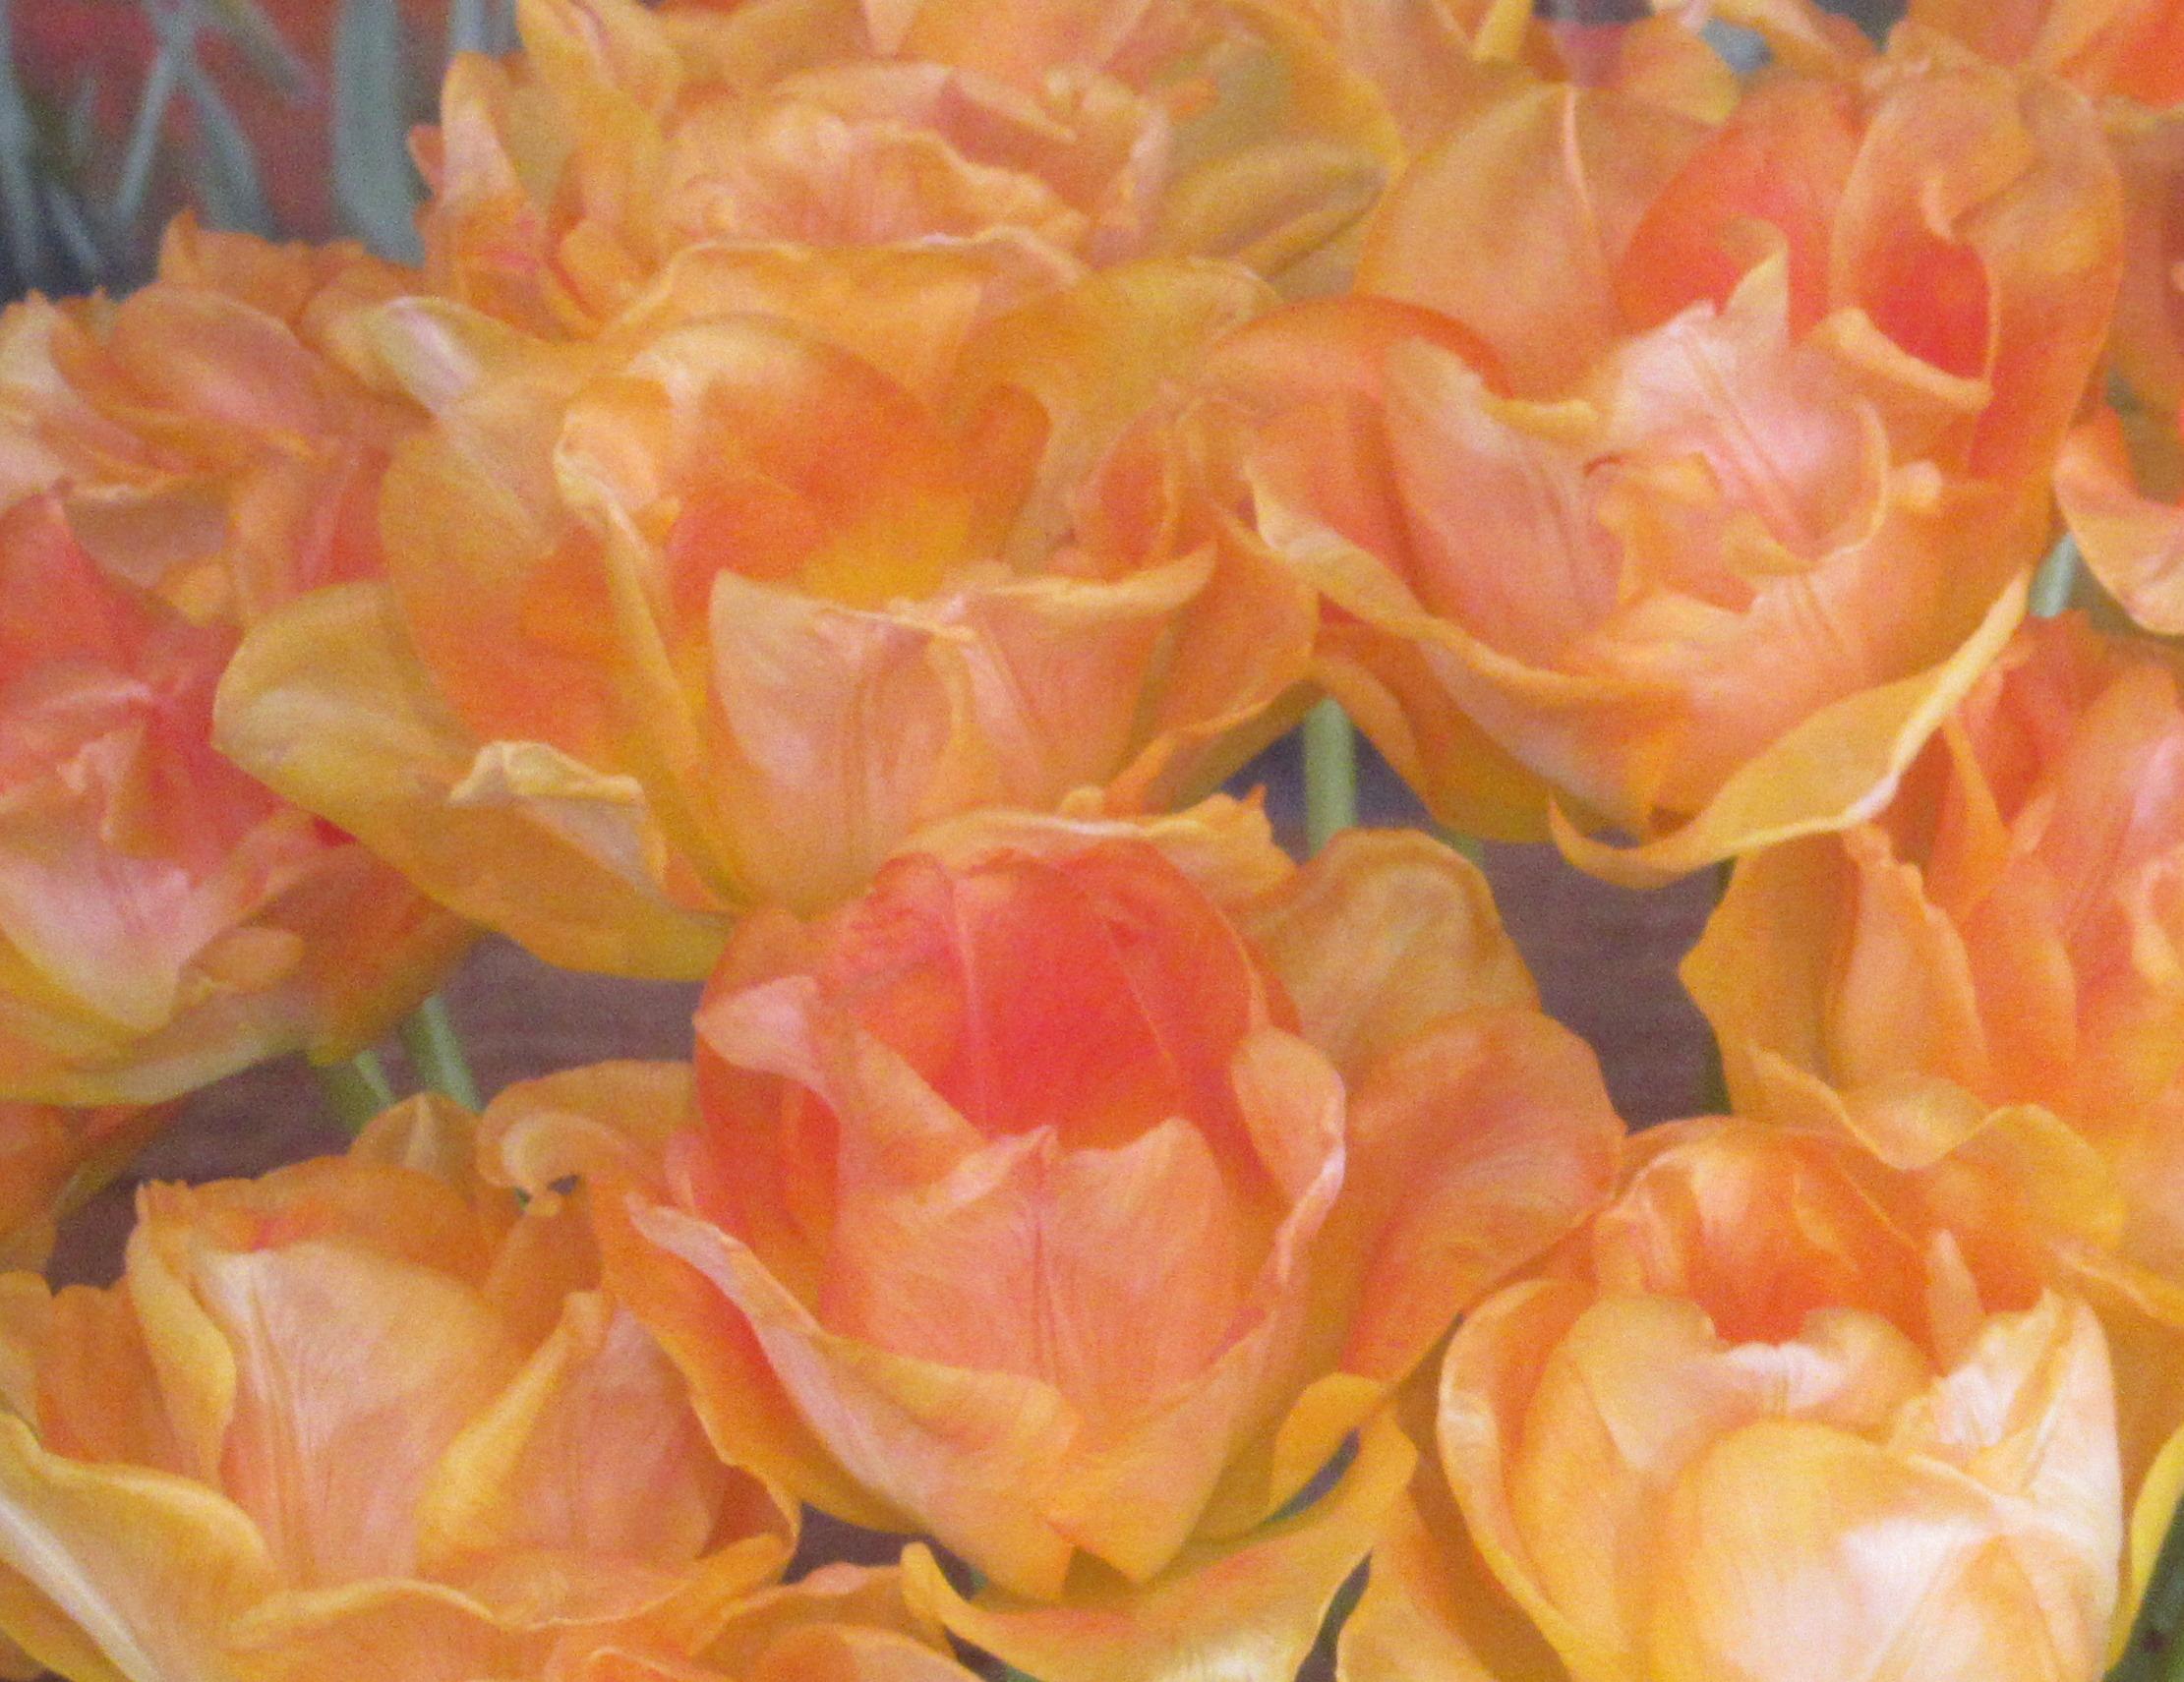 orange pink tulips 2 this one.jpg